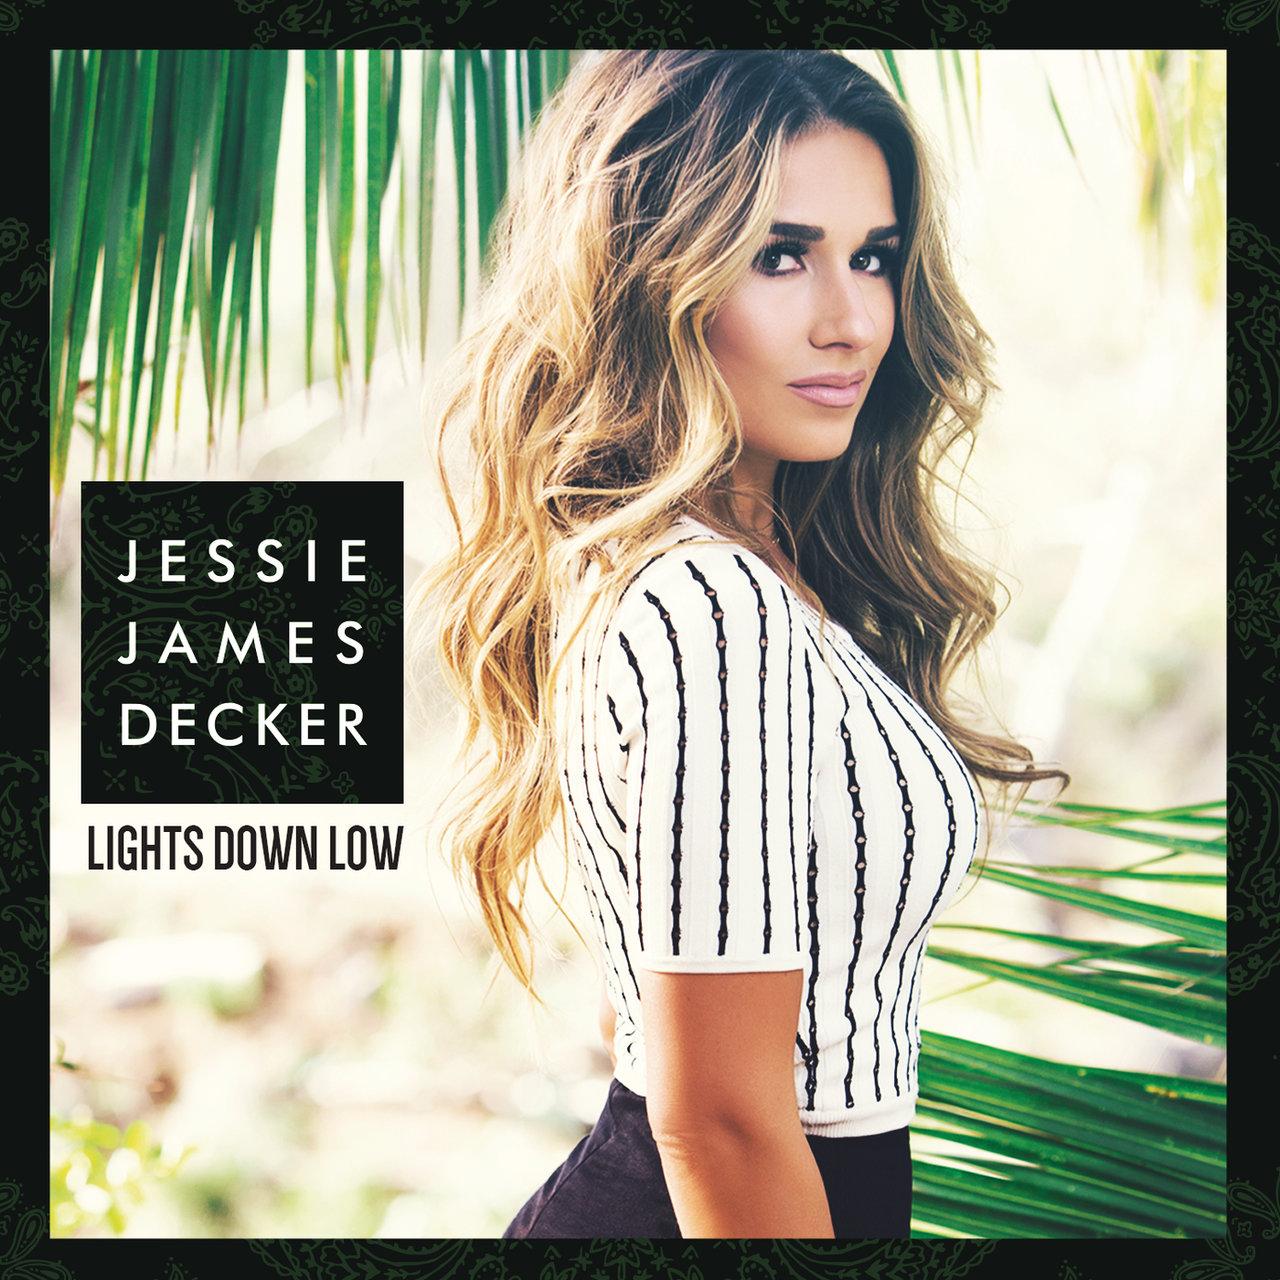 TIDAL: Listen to Jessie James Decker on TIDAL